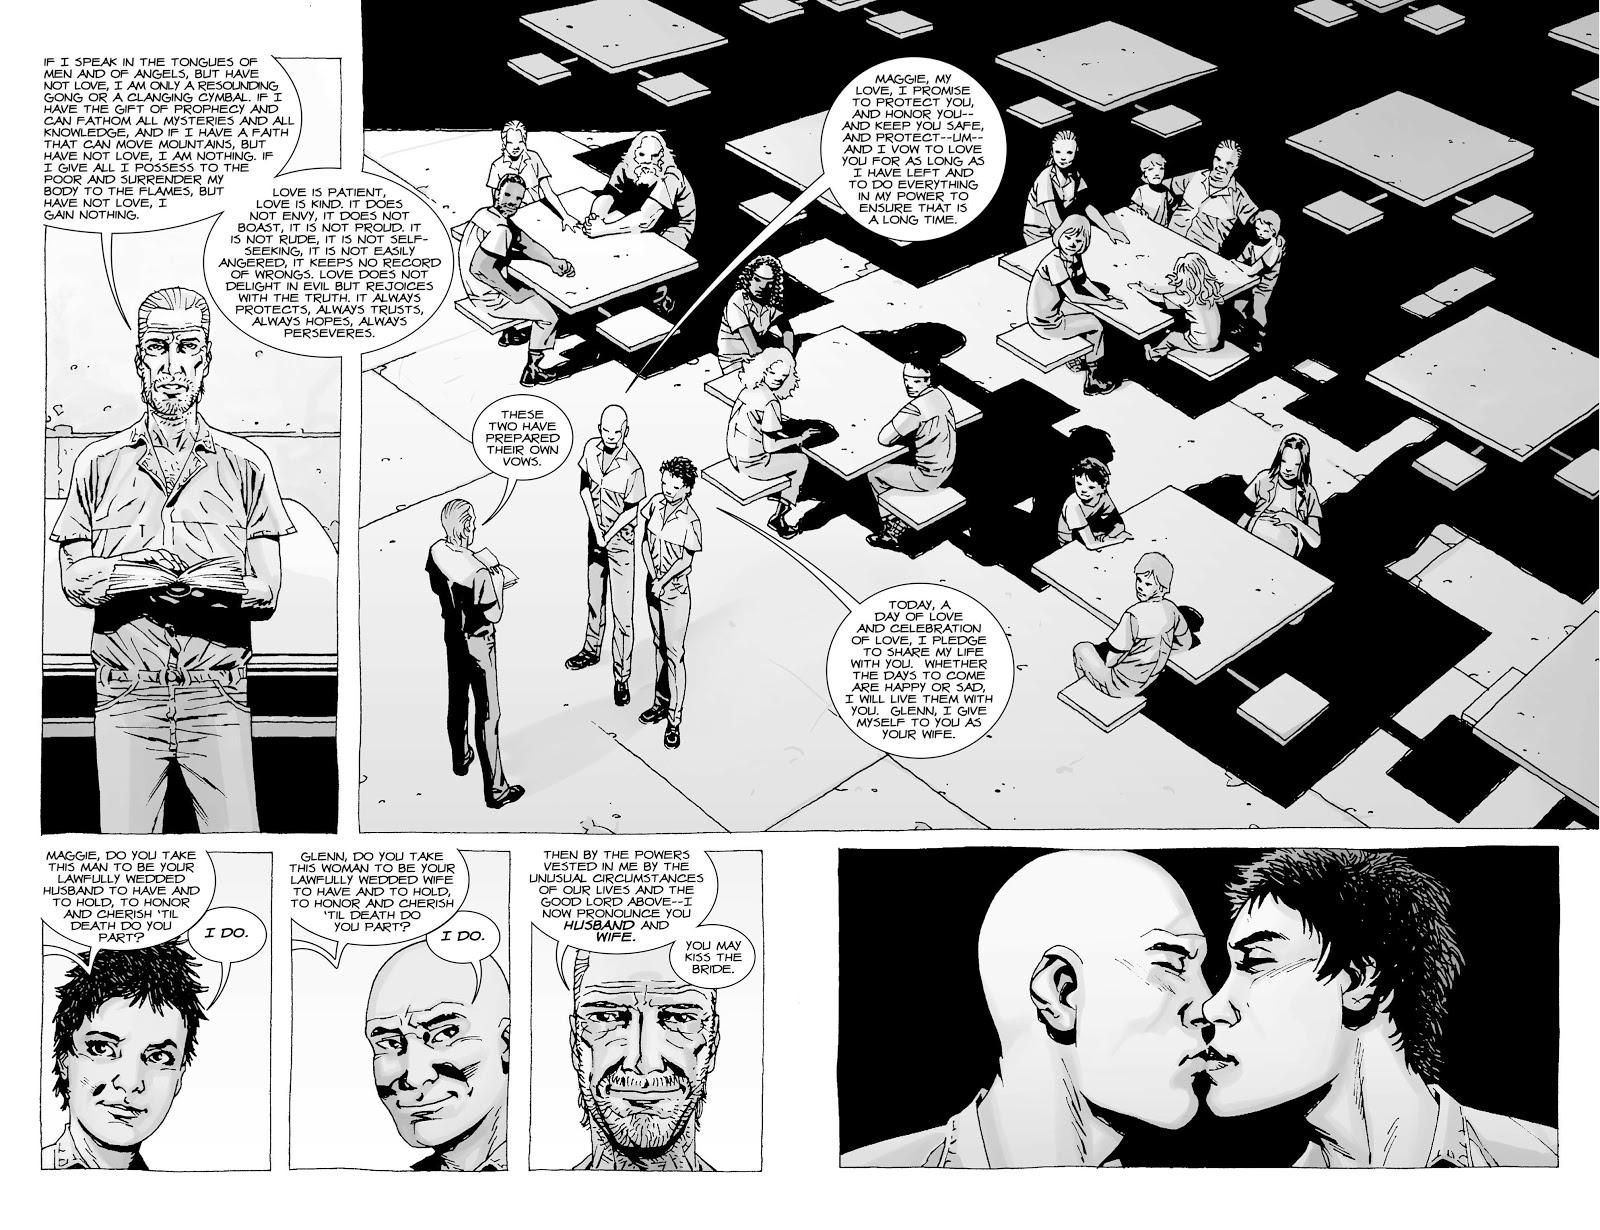 Glenn Rhee And Maggie Greene's Wedding (The Walking Dead)